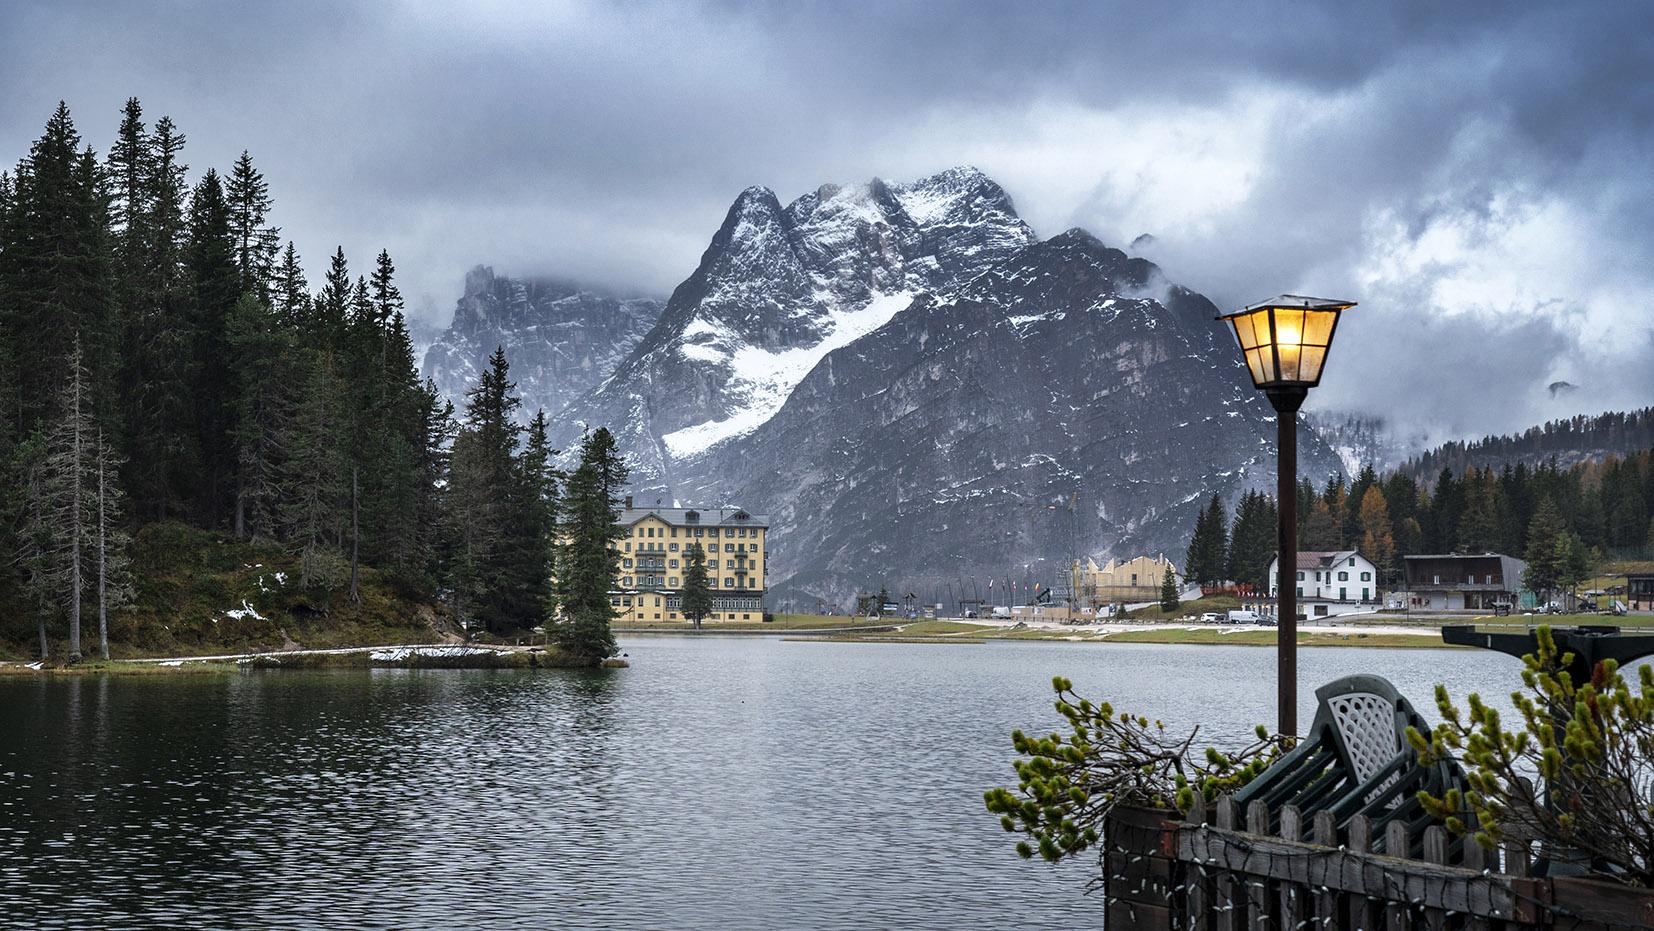 lago di Misurina Dolomites Italie opera jaune montagnes neige réverbère